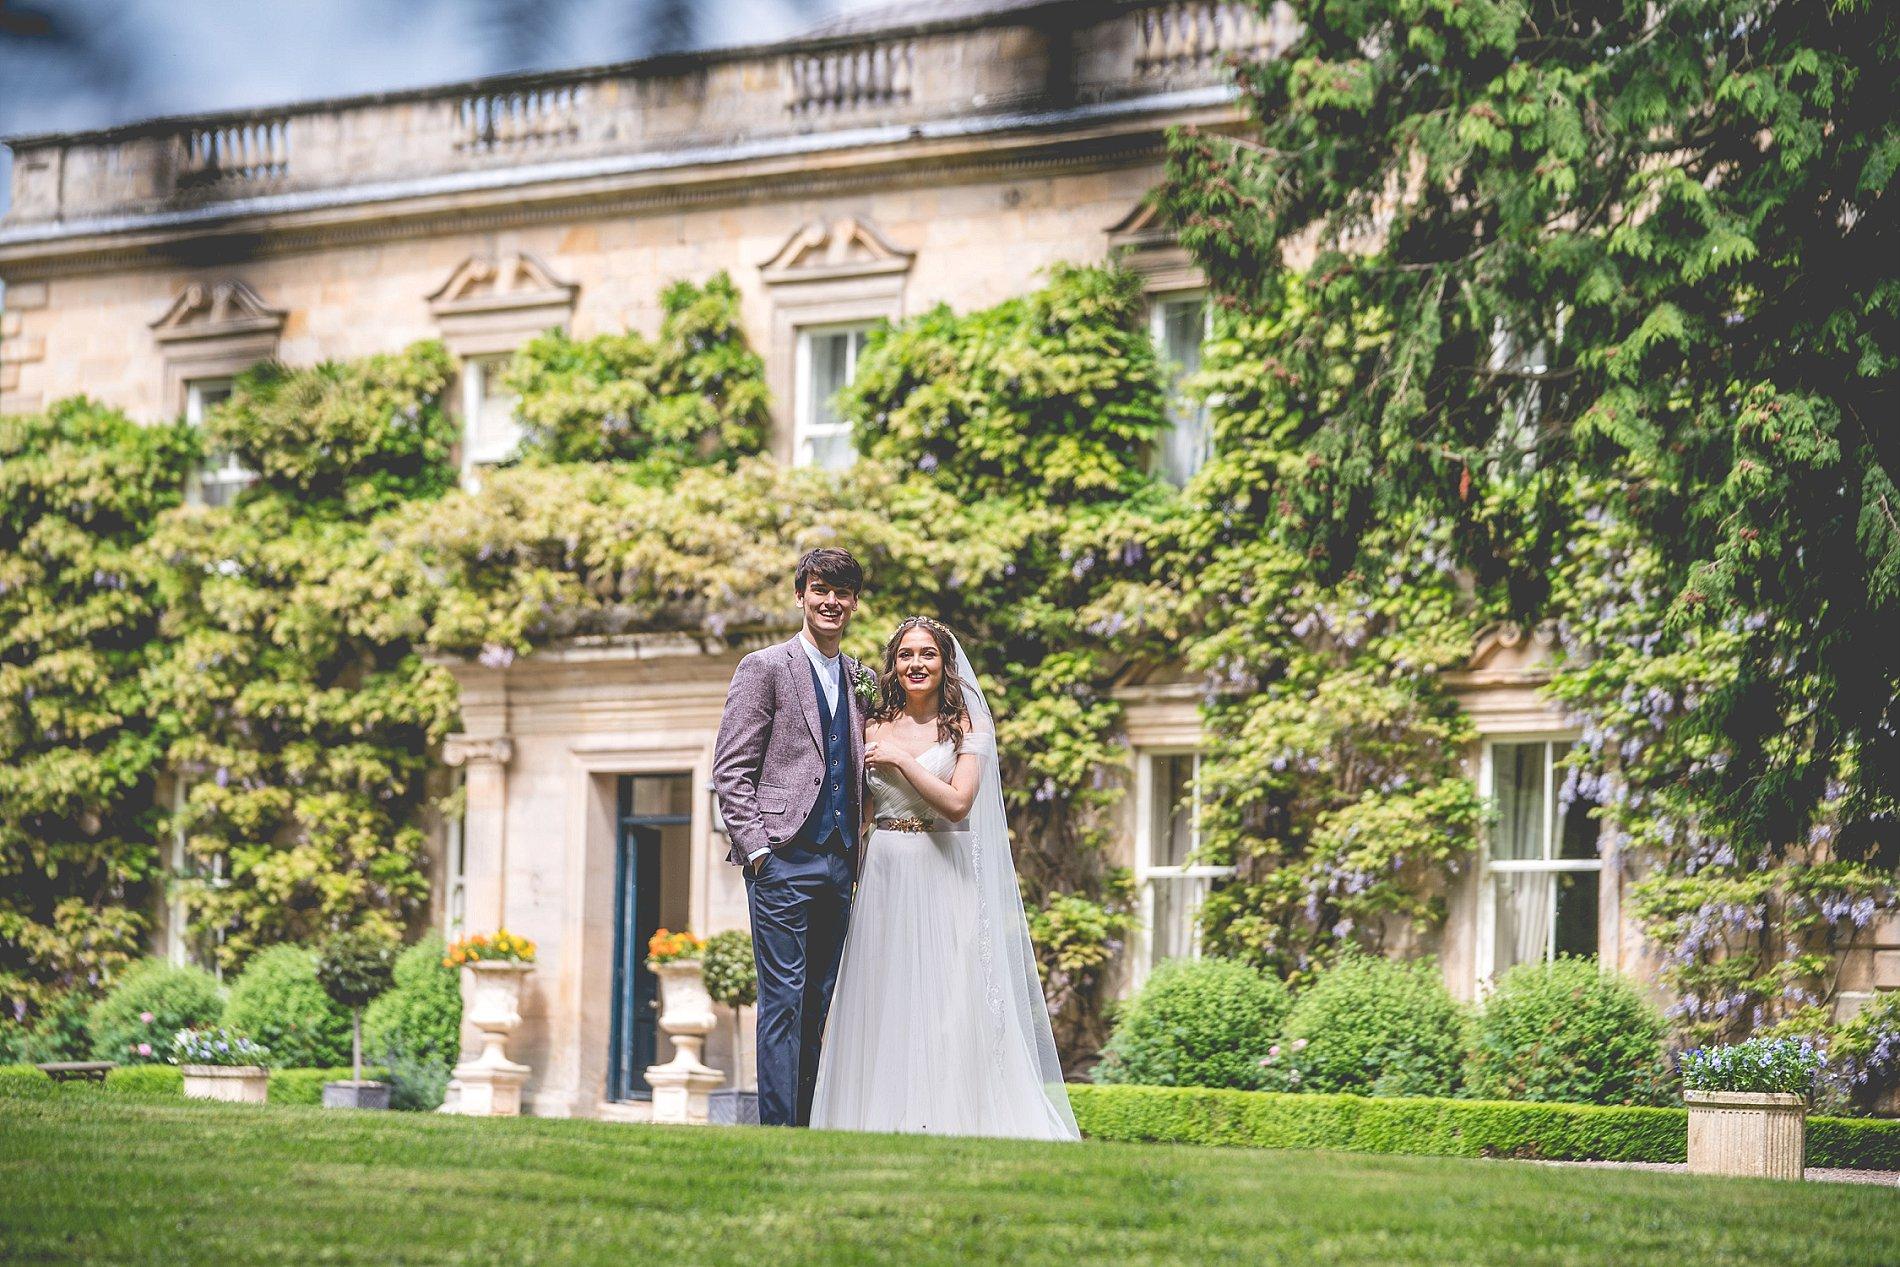 A Styled Bridal Shoot at Eshott Hall (c) Sean Elliott Photography (39)